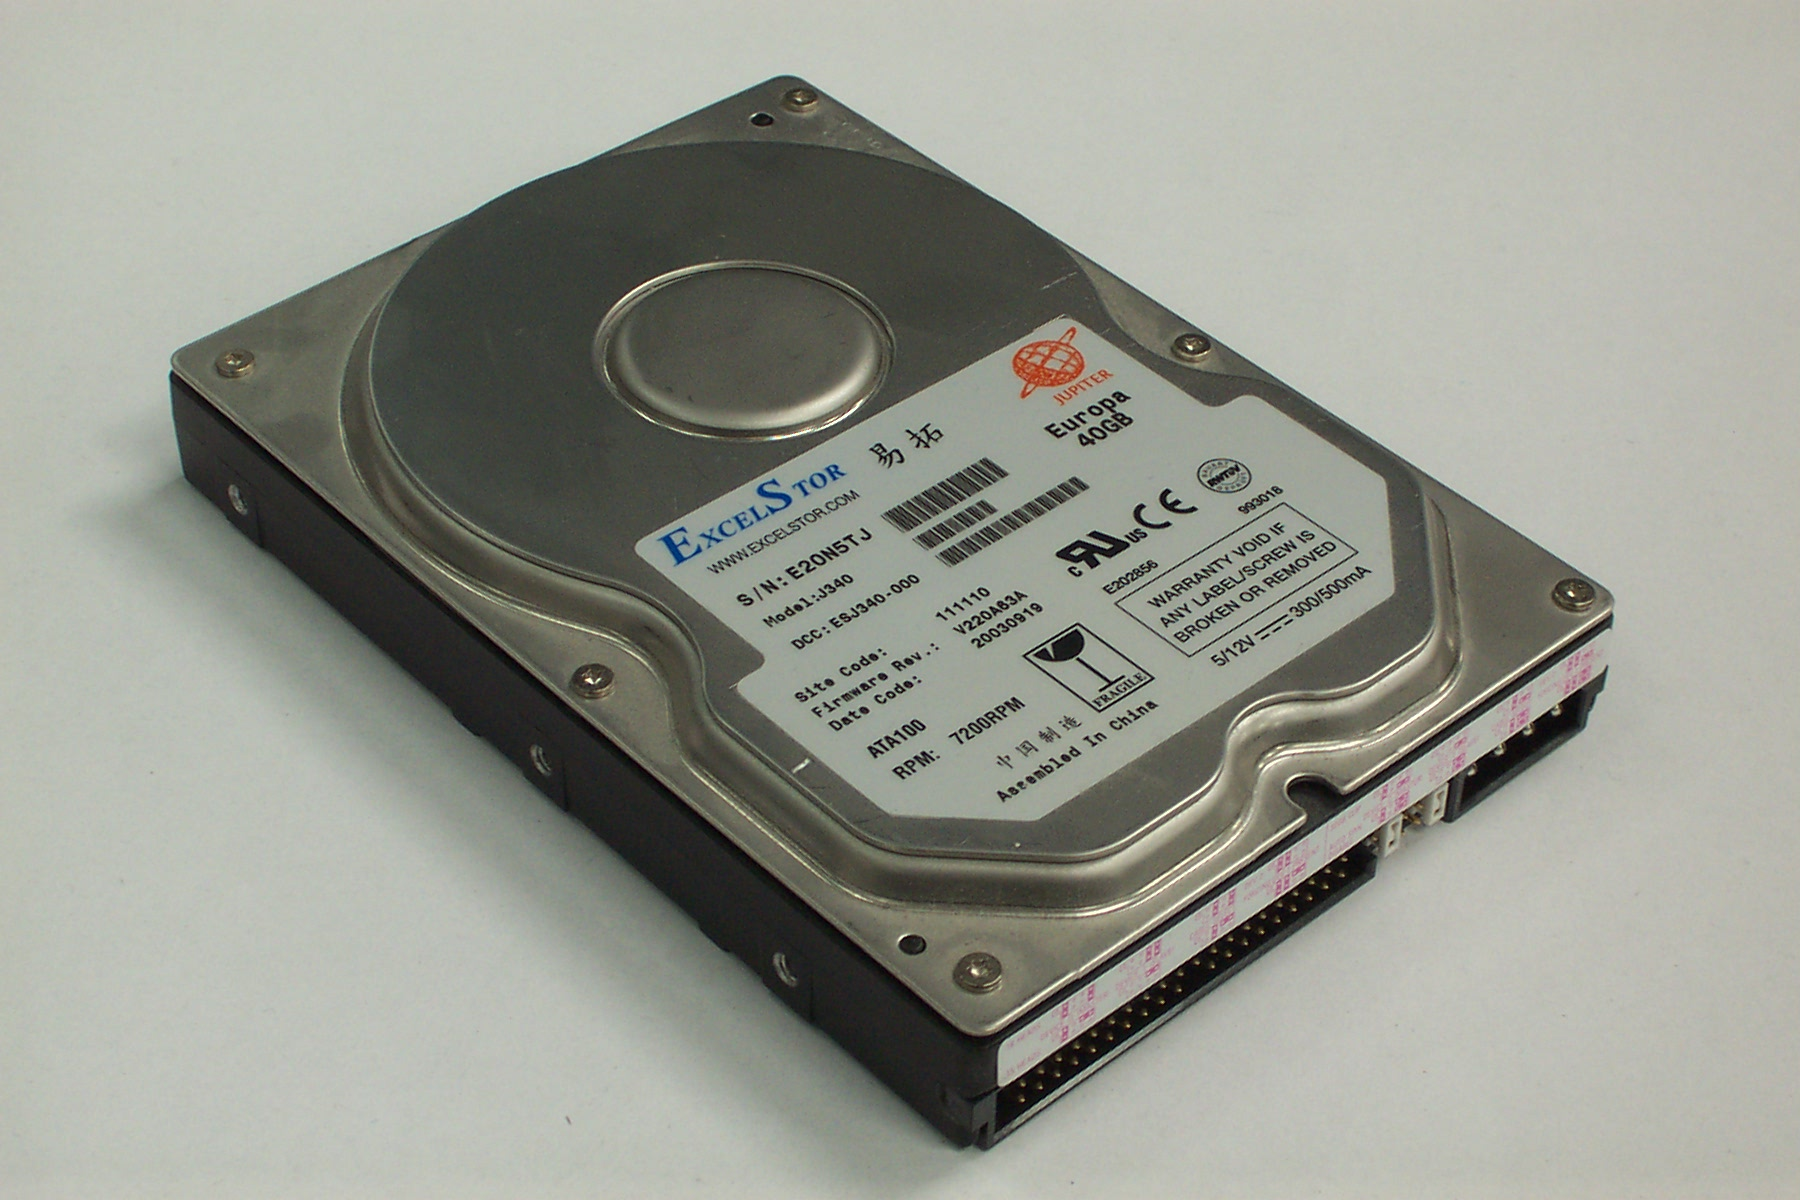 ExcelStor J340 Europa 40GB 7200RPM IDE Hard Disk Drive   eBay